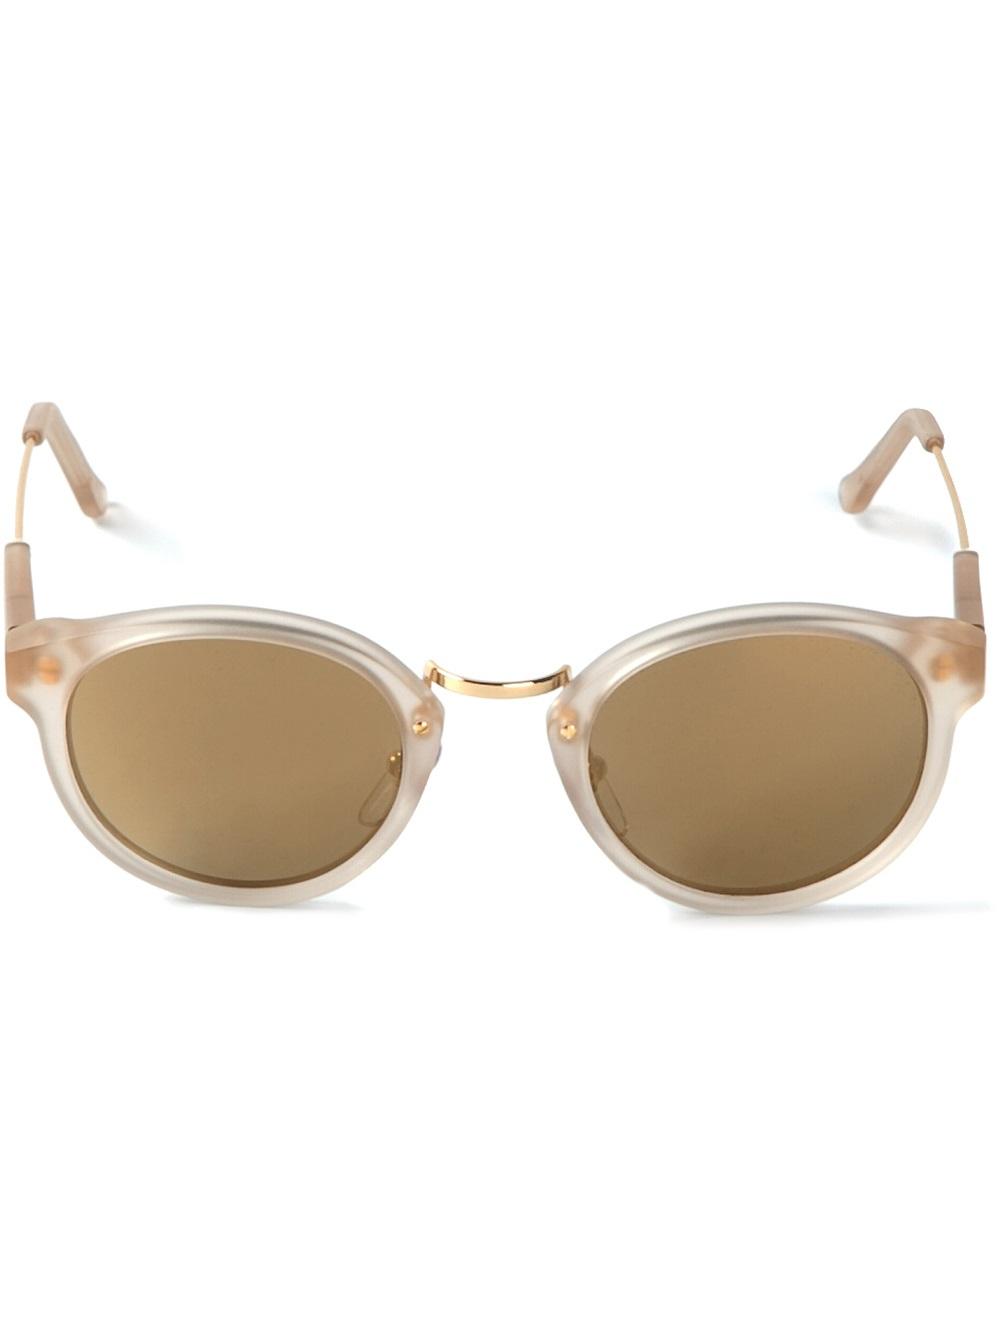 5ab4432323b8 Lyst - Retrosuperfuture  paloma Oracle  Sunglasses in Natural